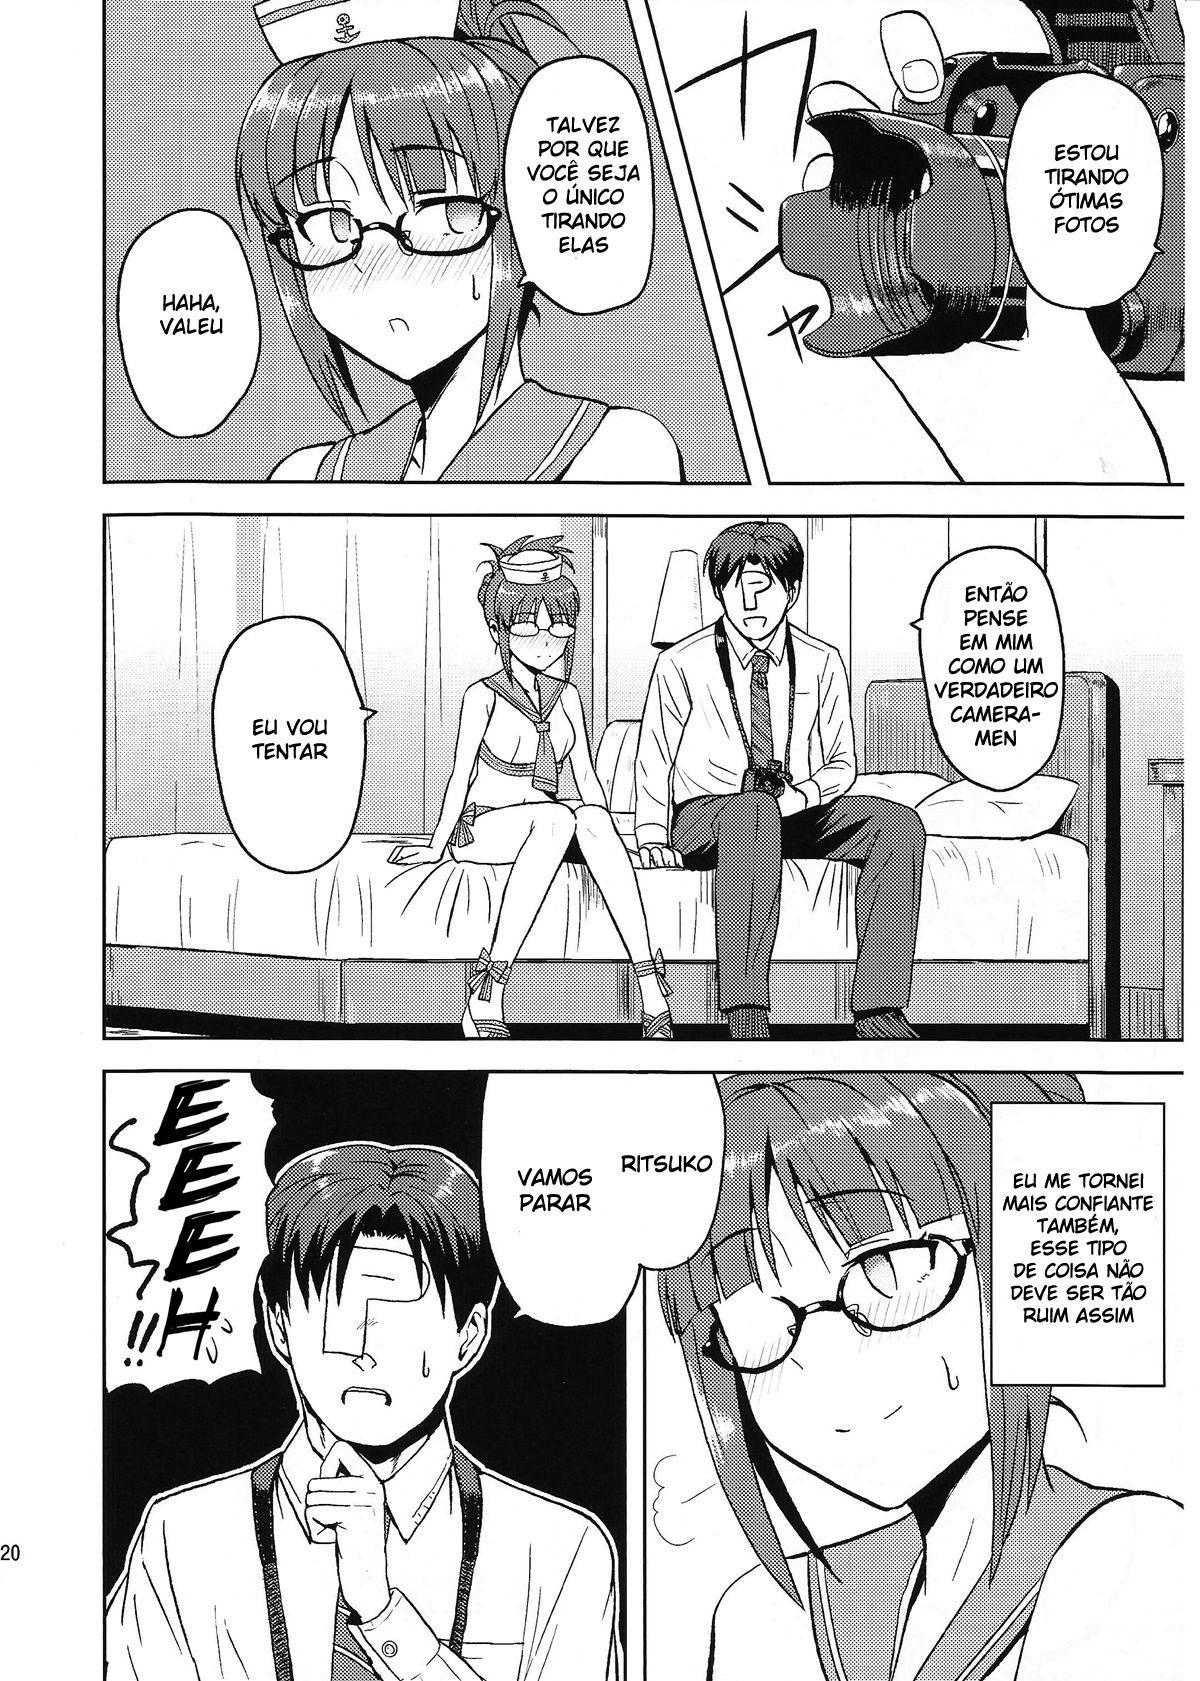 Ritsuko, a marinheira tarada